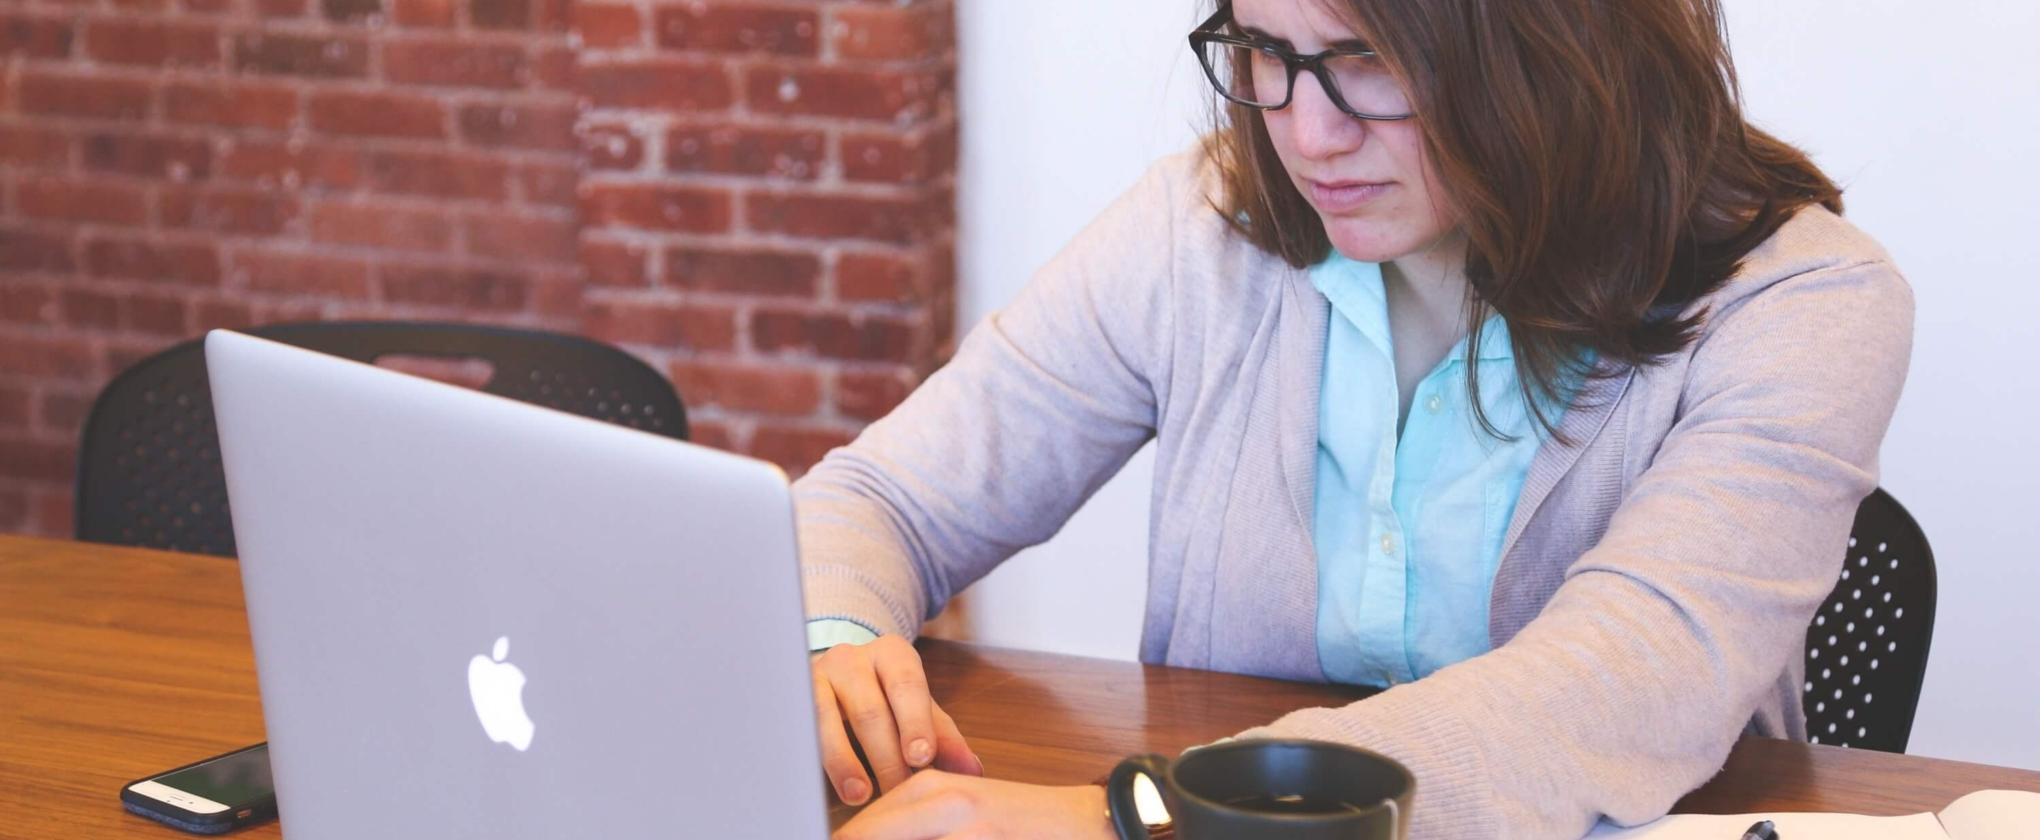 Involving Staff in Product Development